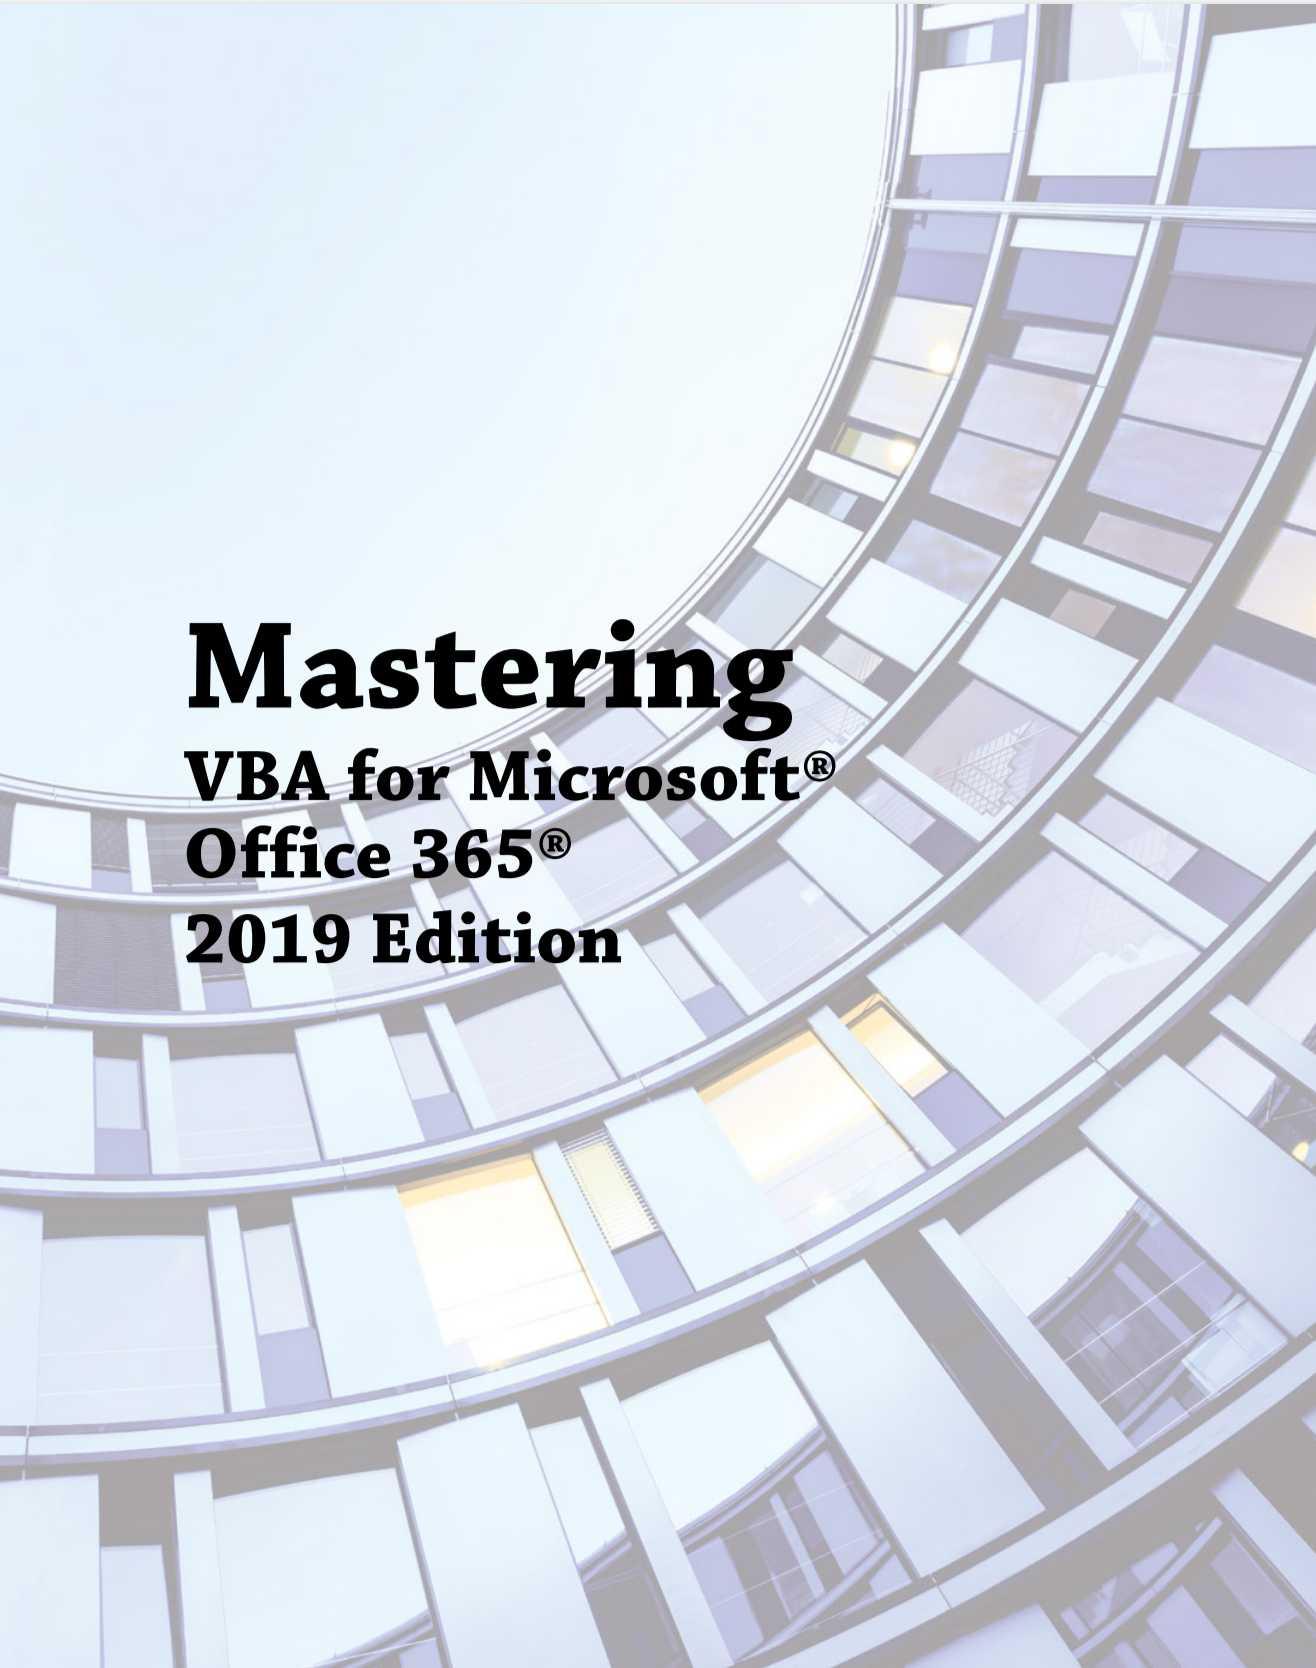 Mastering VBA 2019: For Microsoft Office 365: 2019 Edition